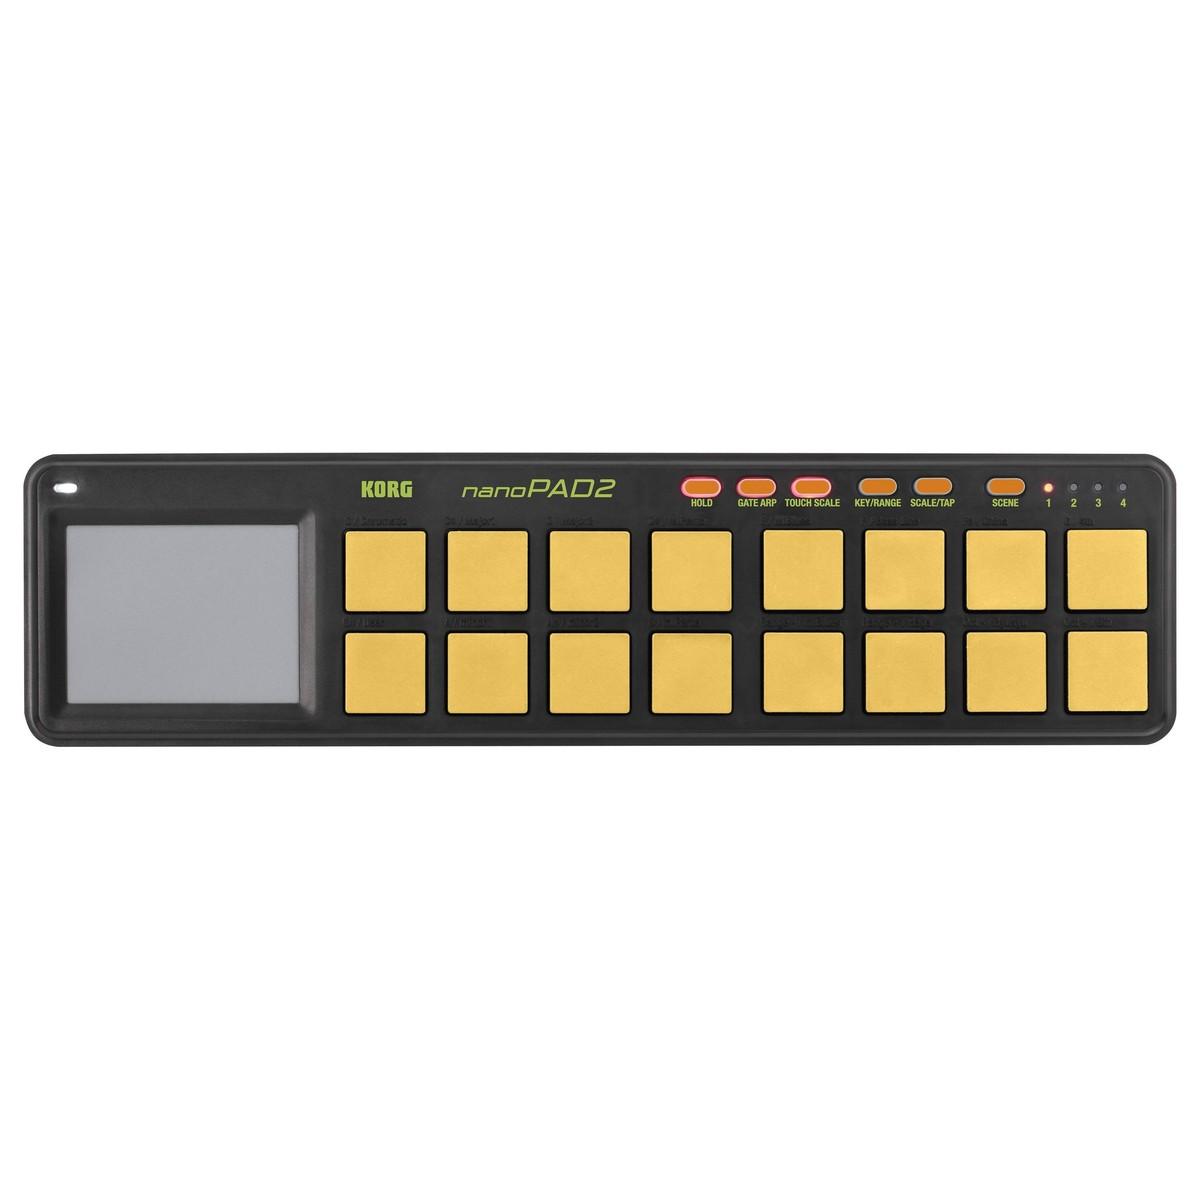 Korg nanoPAD2 Slim-Line USB Pad Controller - Orange/Green Limited Edition